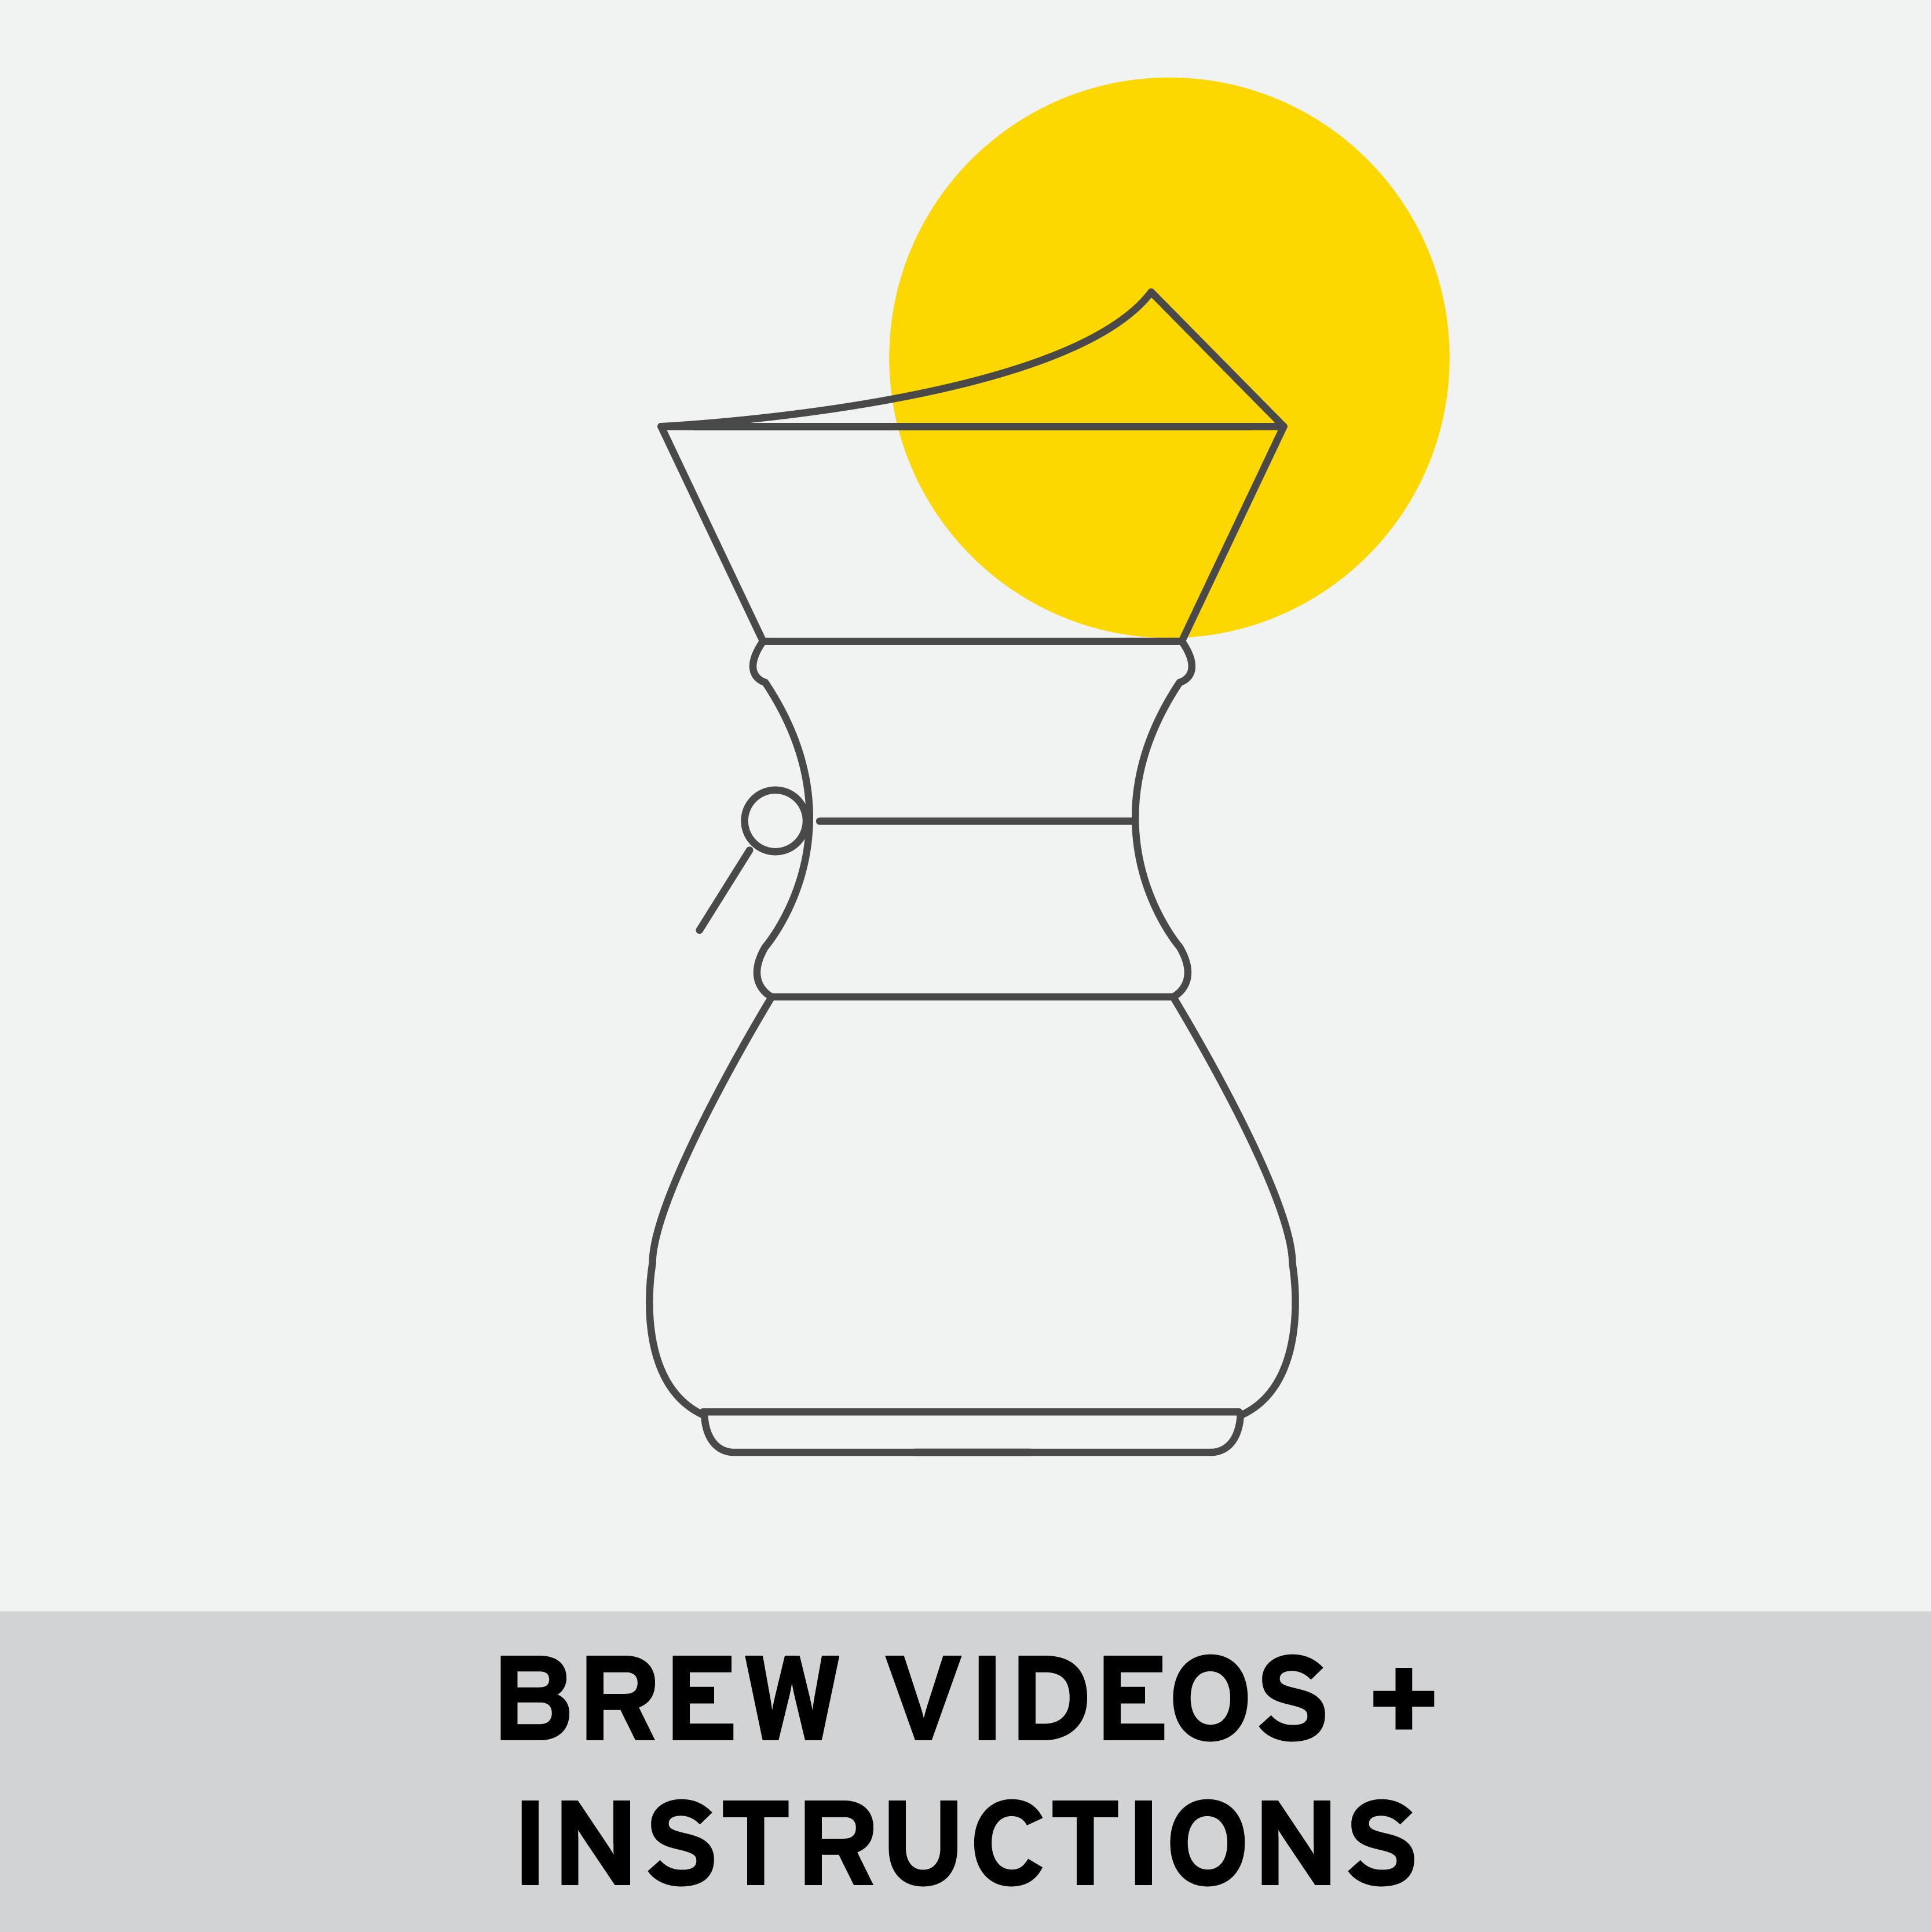 BREW VIDEOS + INSTRUCTIONS